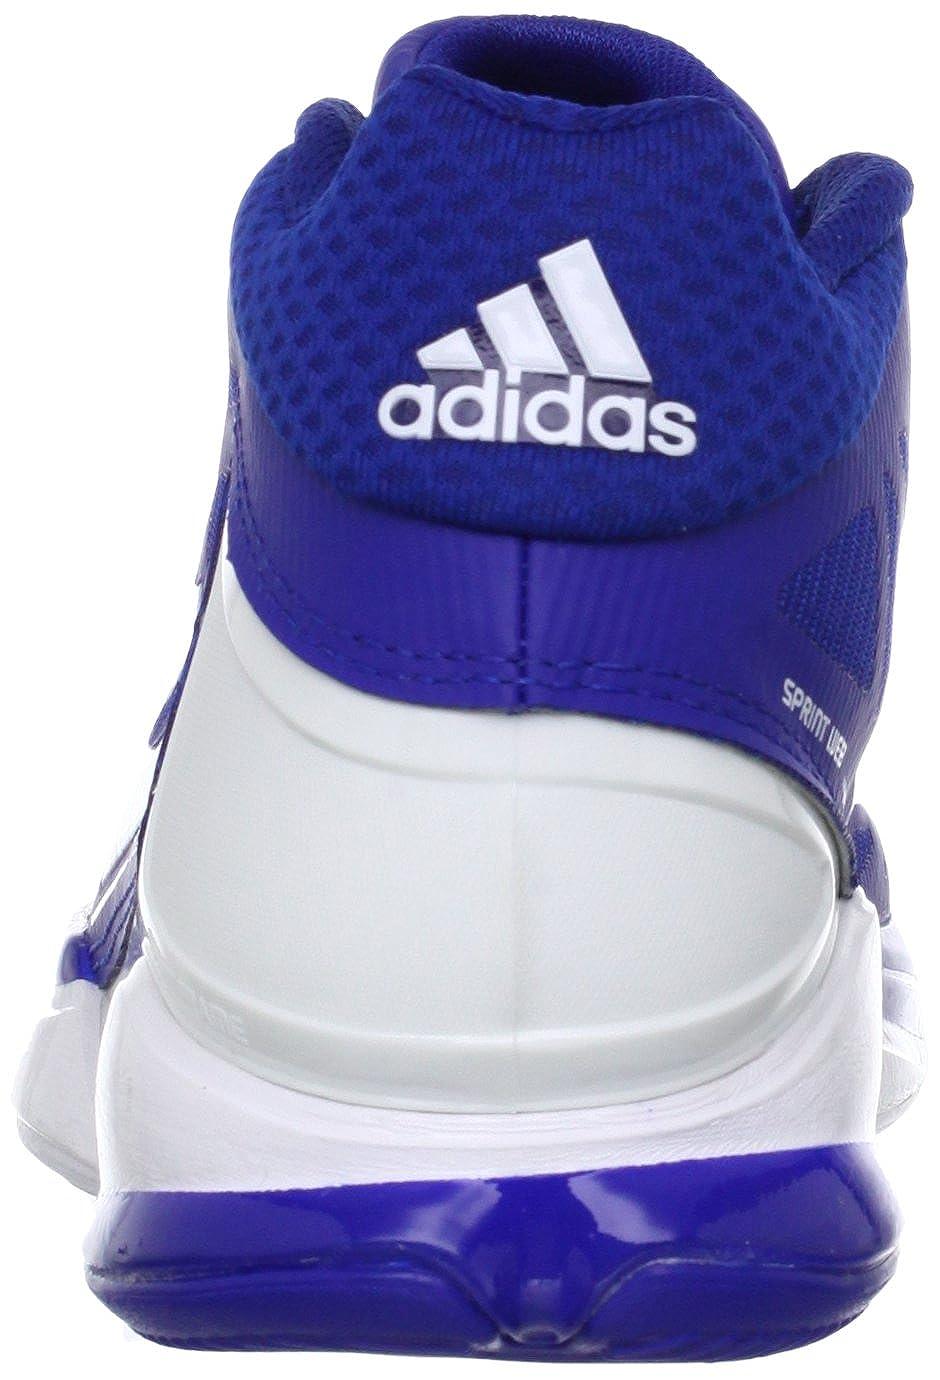 Adidas Crazy Light Light Light 2 Low blau Weiss 3f16f0